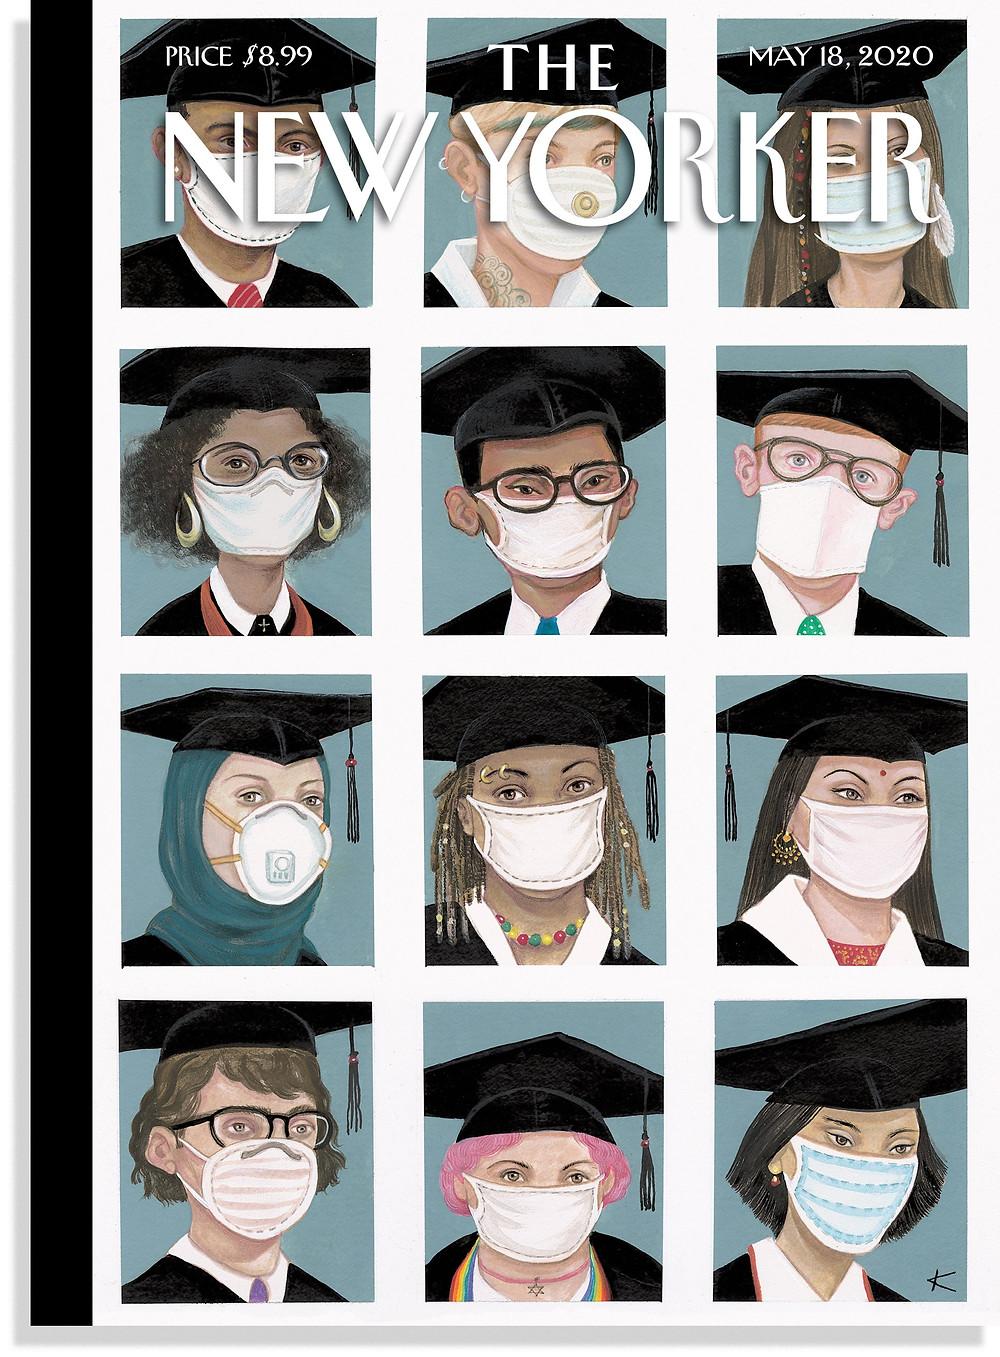 """Class of 2020,"" by Anita Kunz, May 18, 2020"